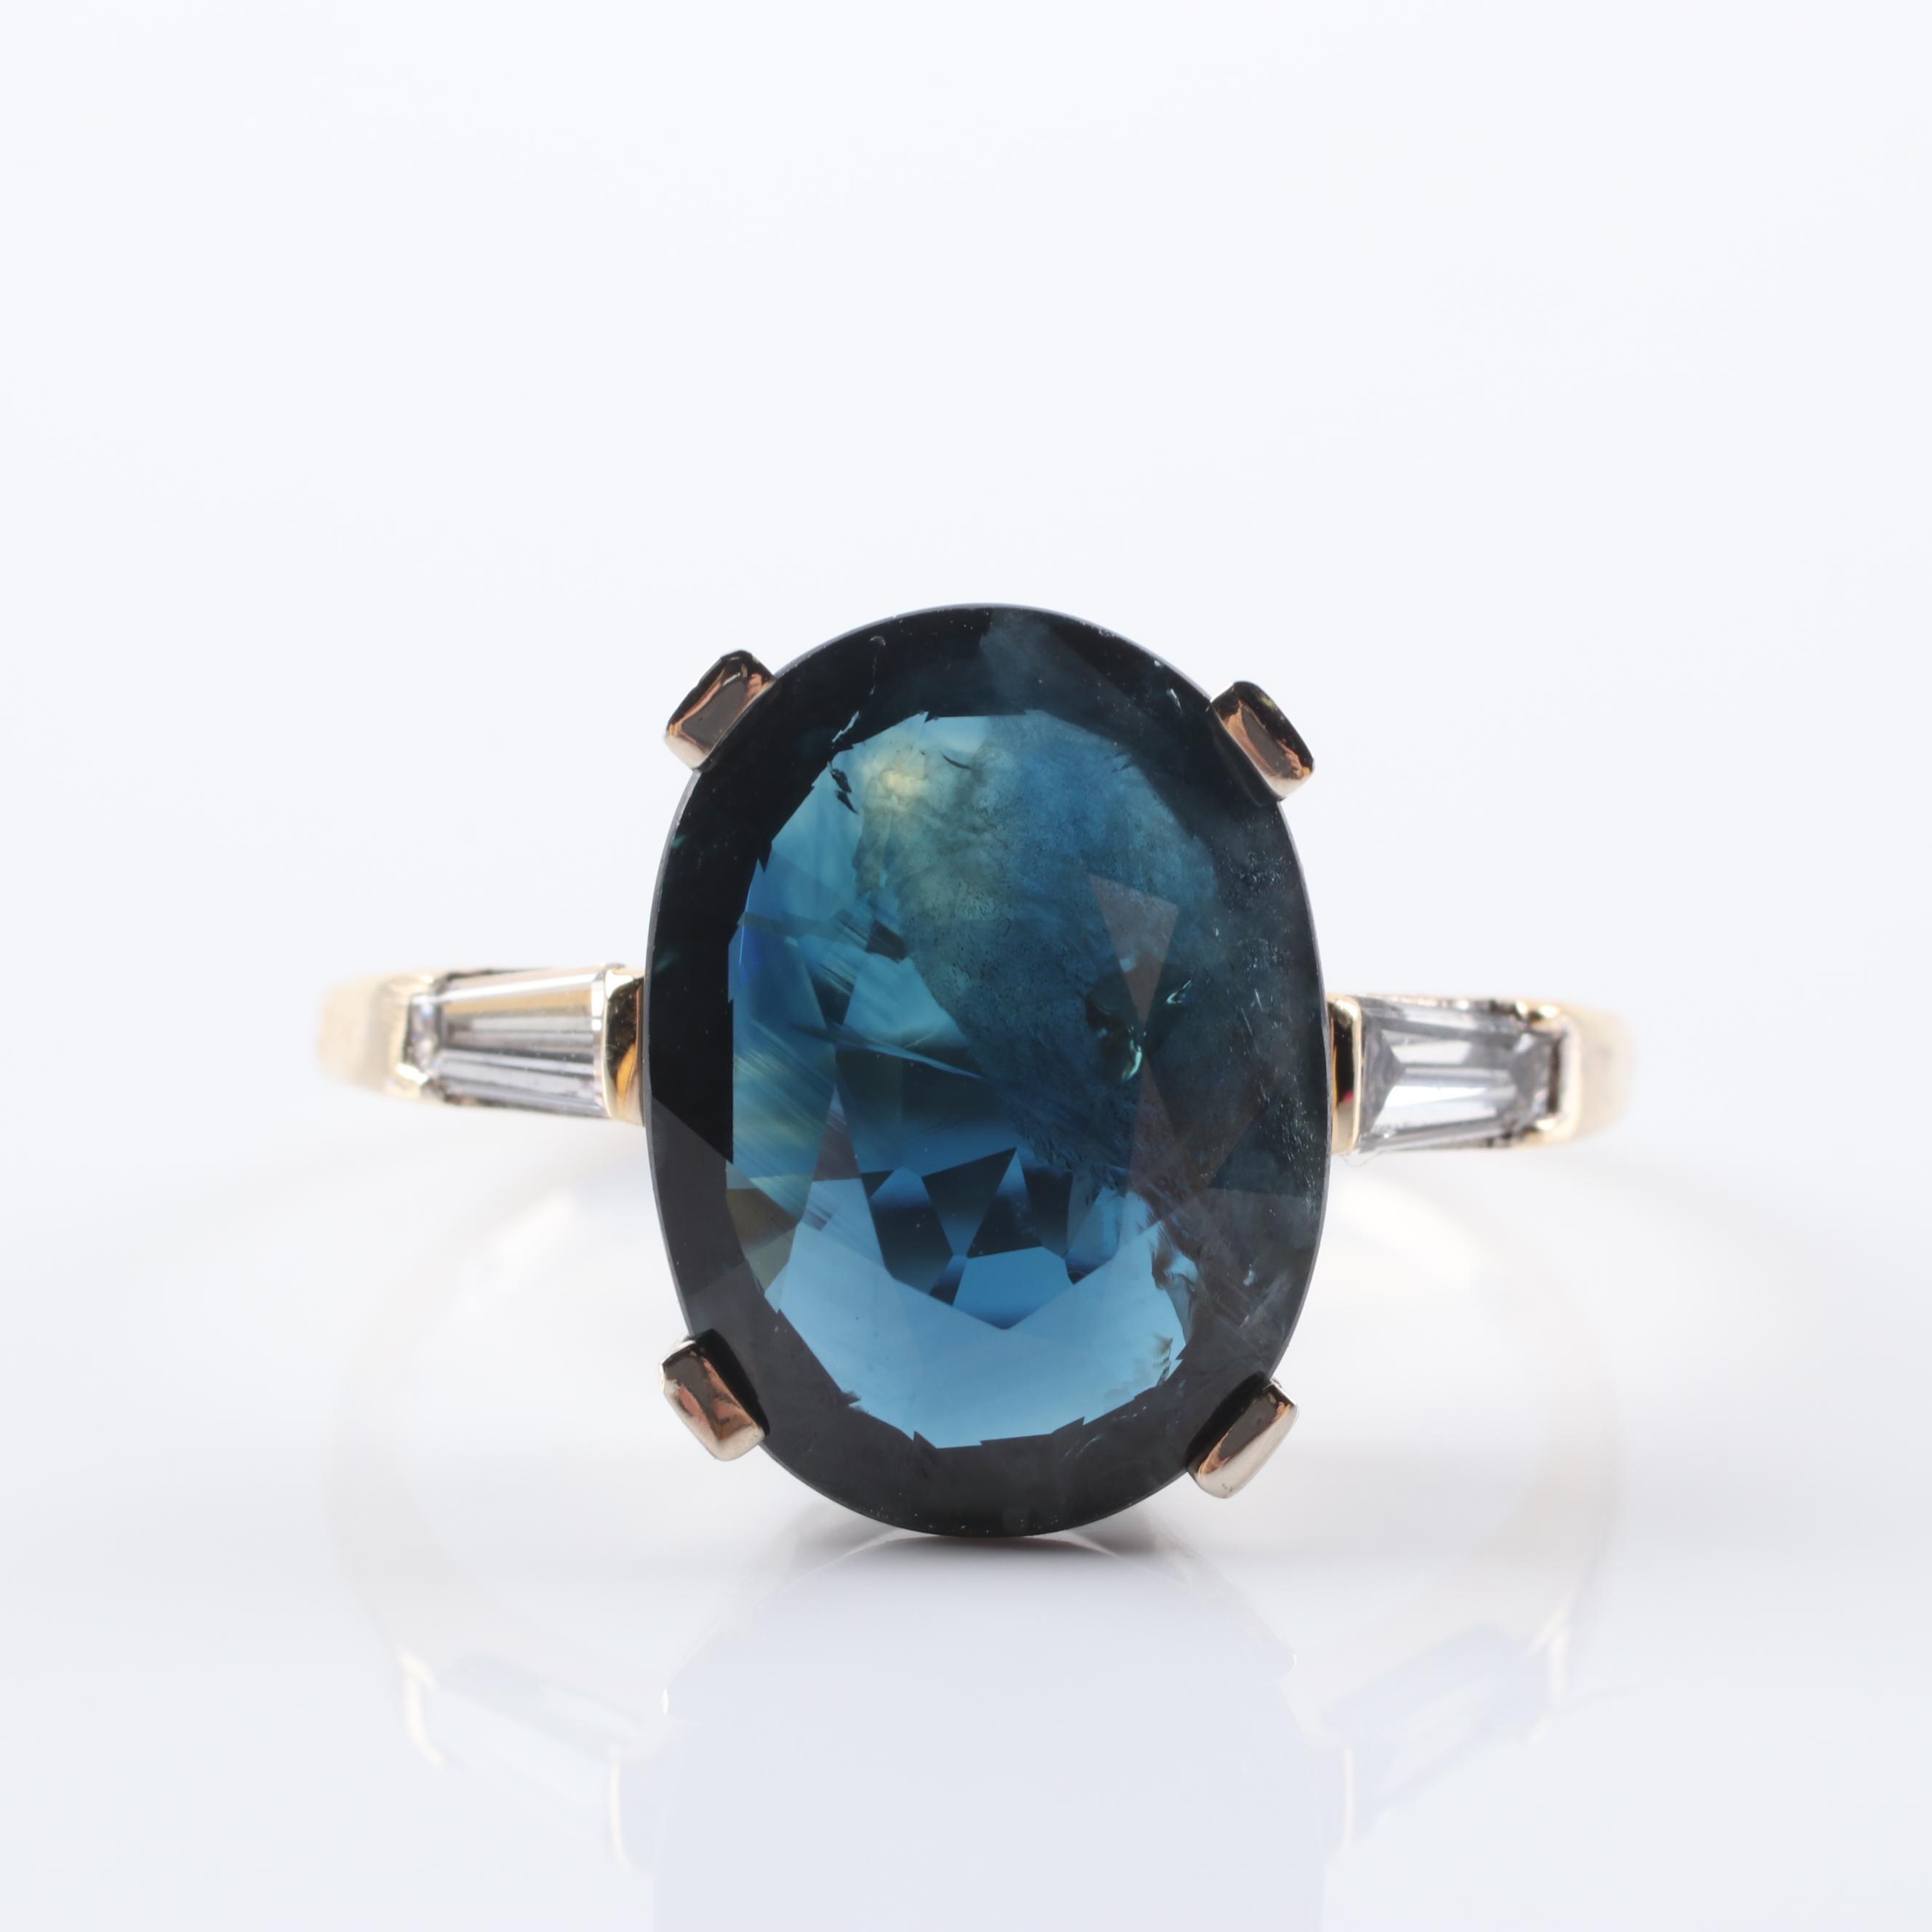 14K Yellow Gold 6.75 CT Sapphire and Diamond Ring